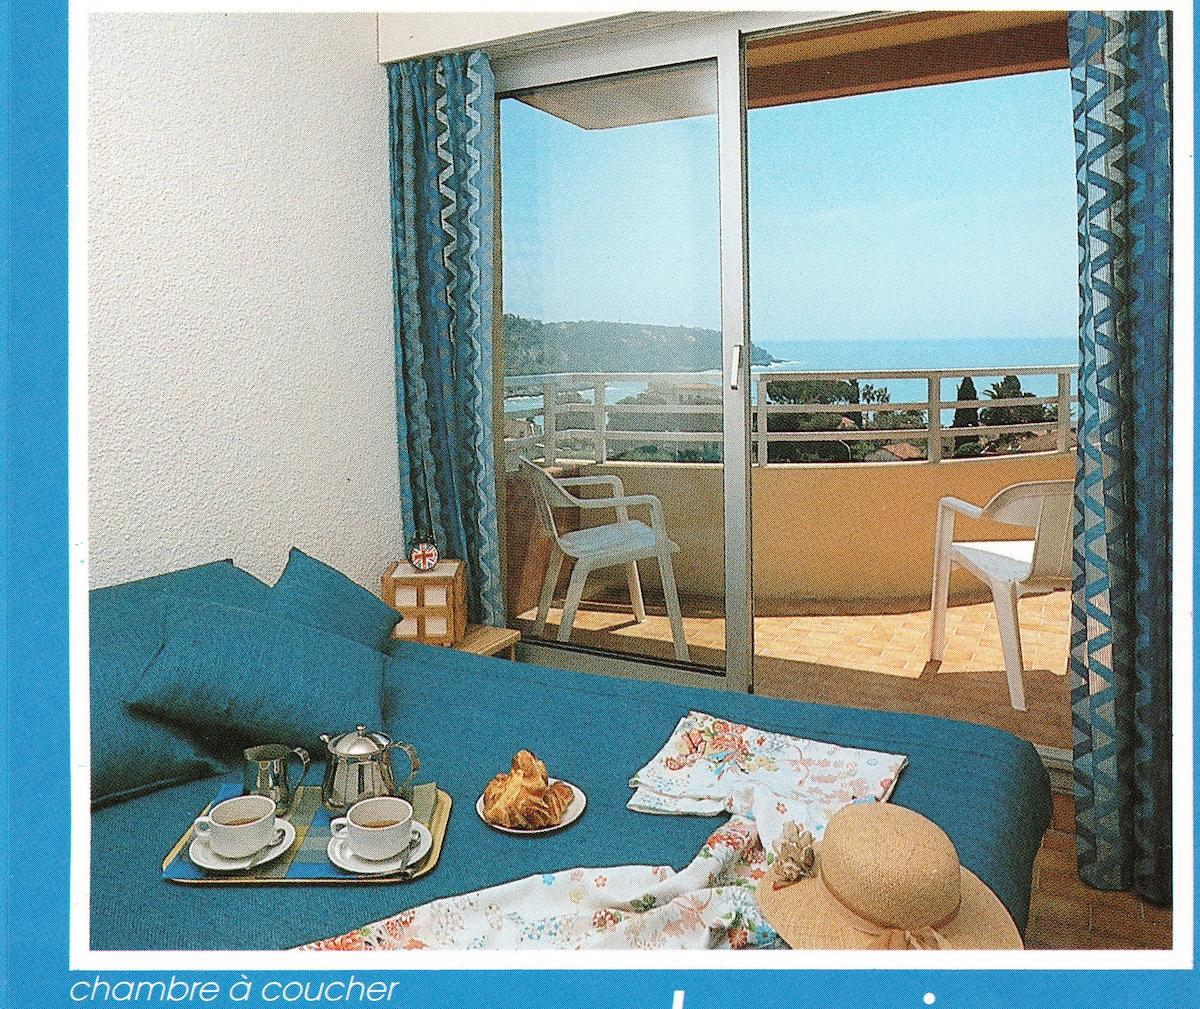 Beau studio avec balcon vue mer